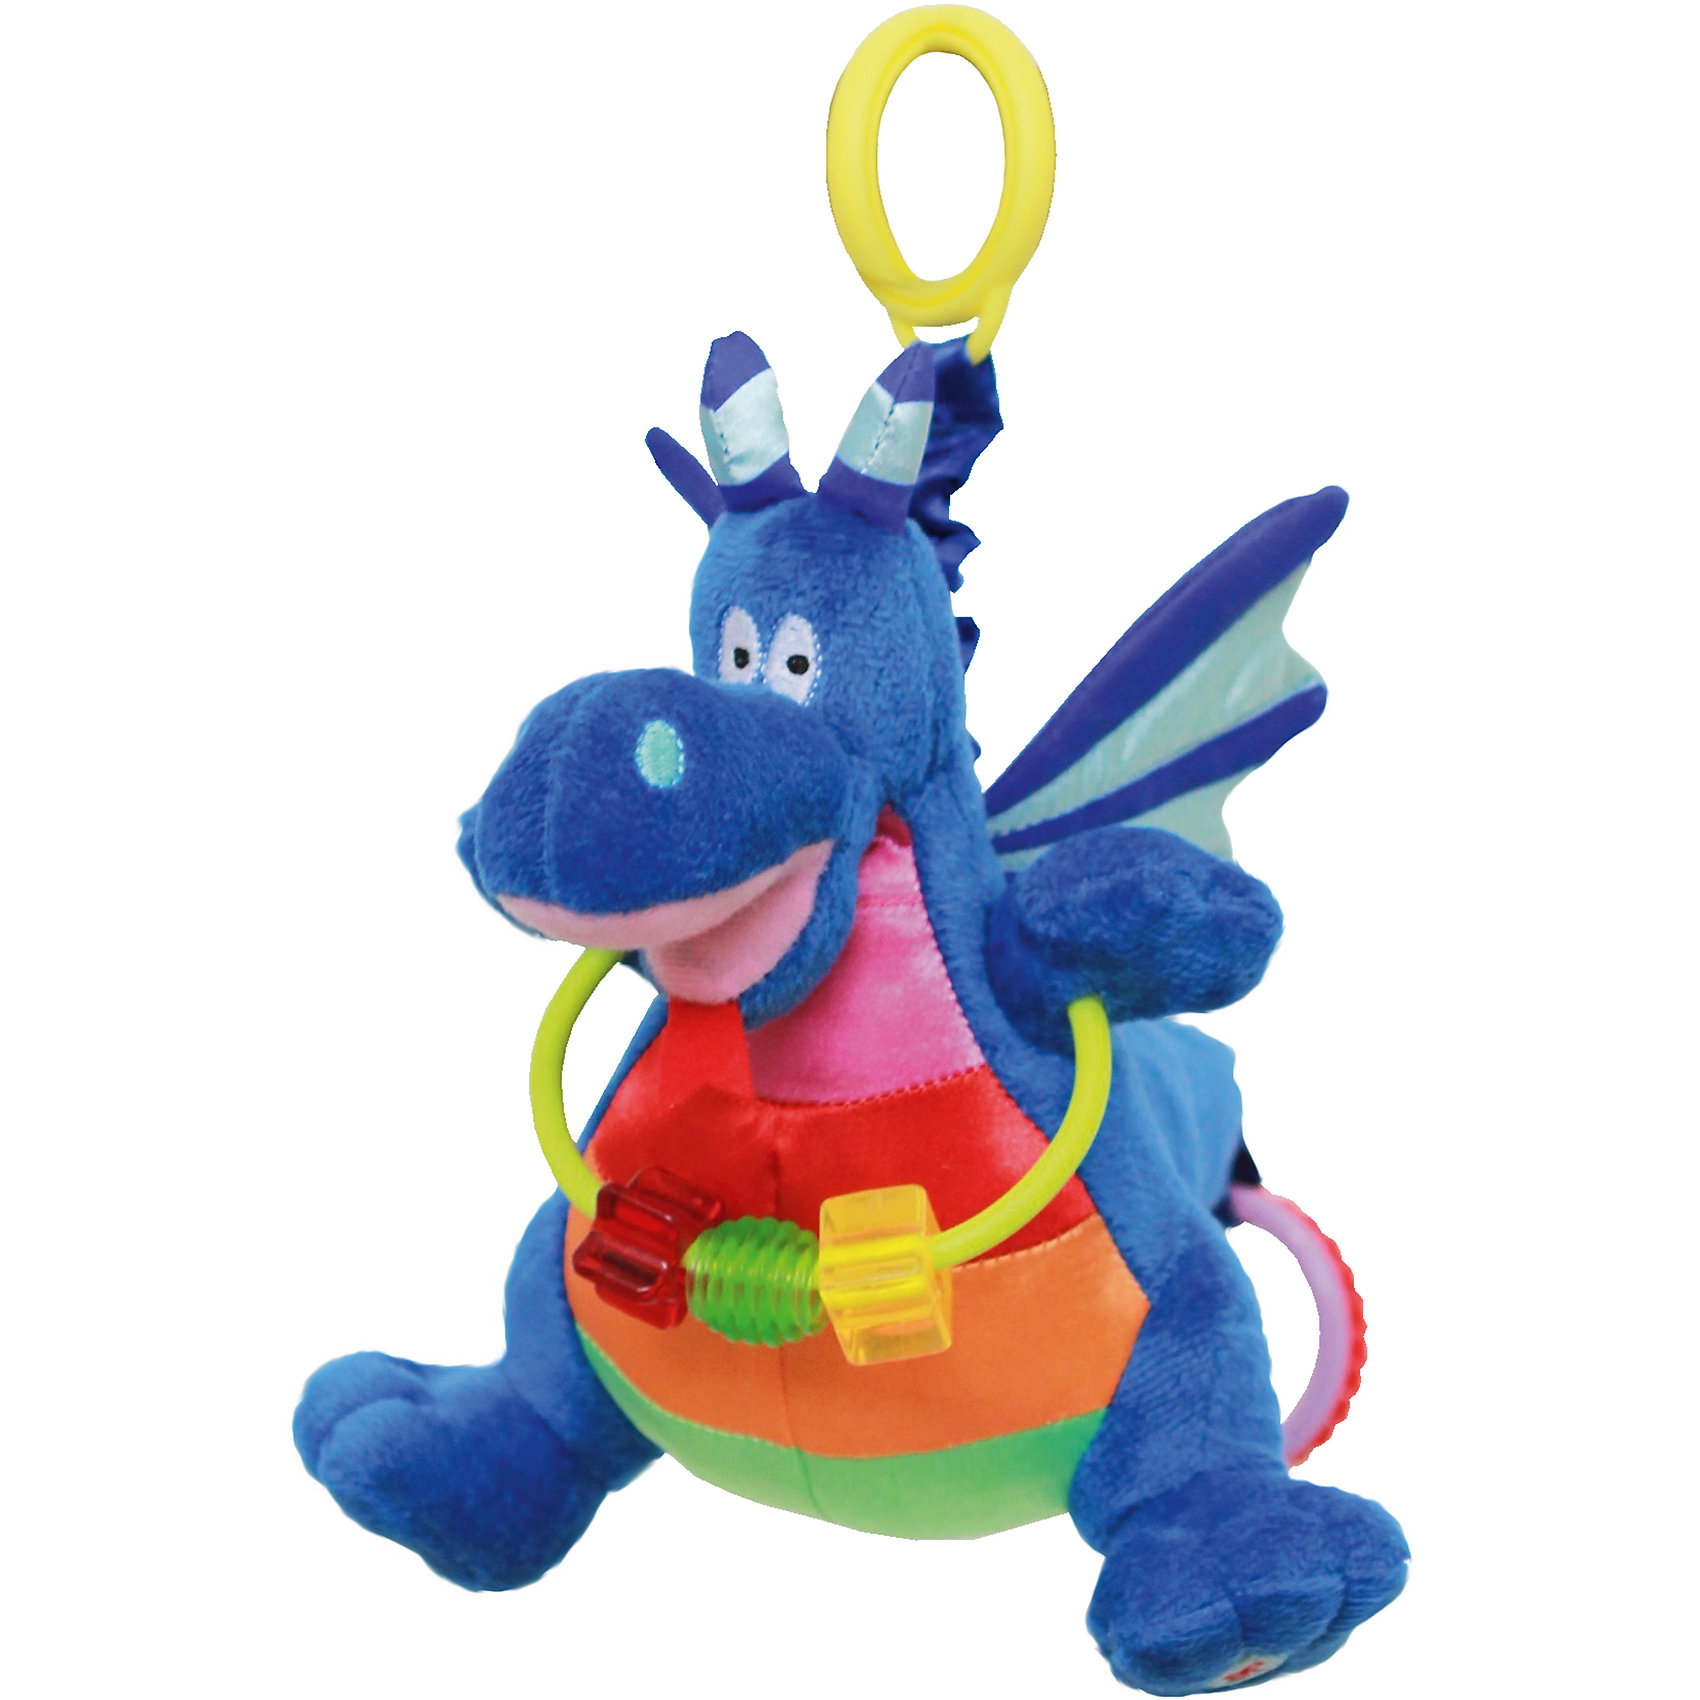 WeeWise Игрушка для коляски Дракон Джеки,  WeeWise weewise моя первая погремушка